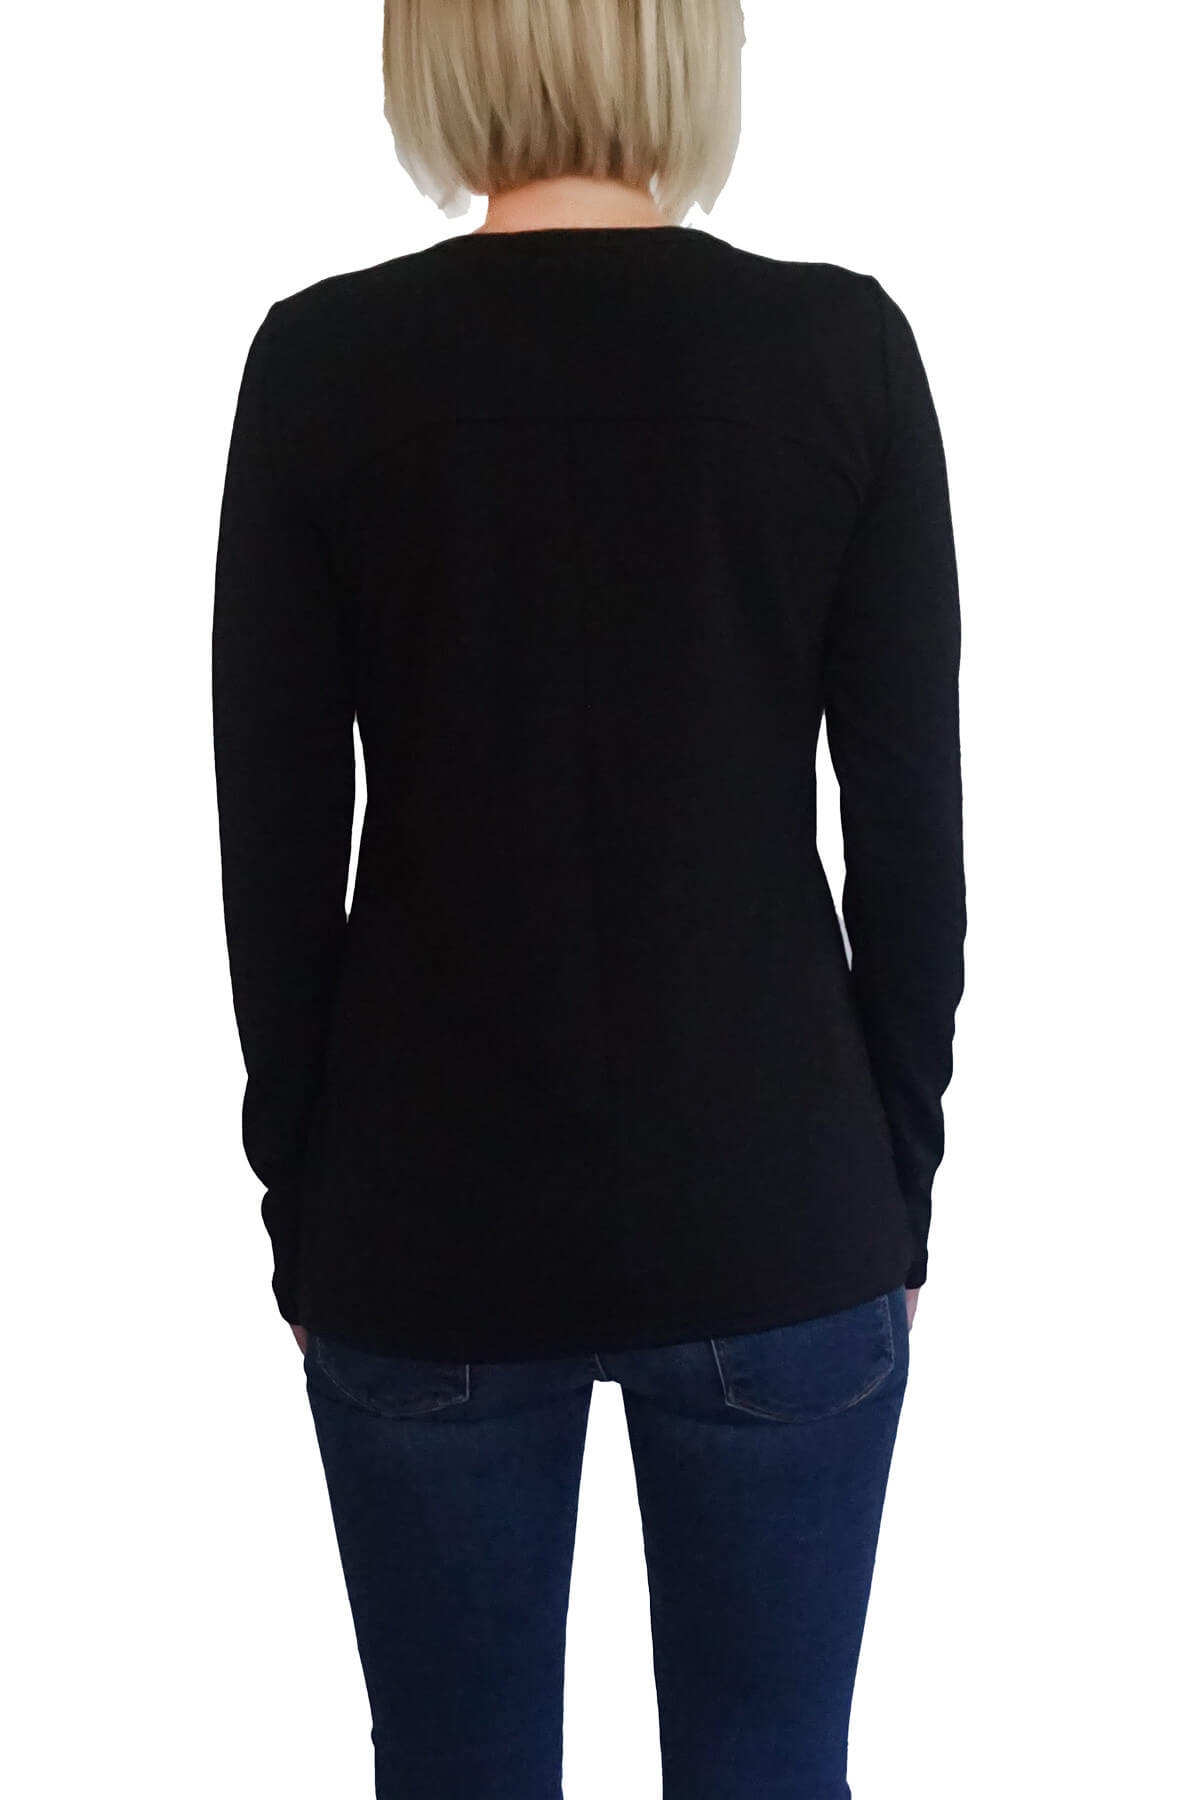 MOF Kadın Siyah T-Shirt UKSYT-S 2